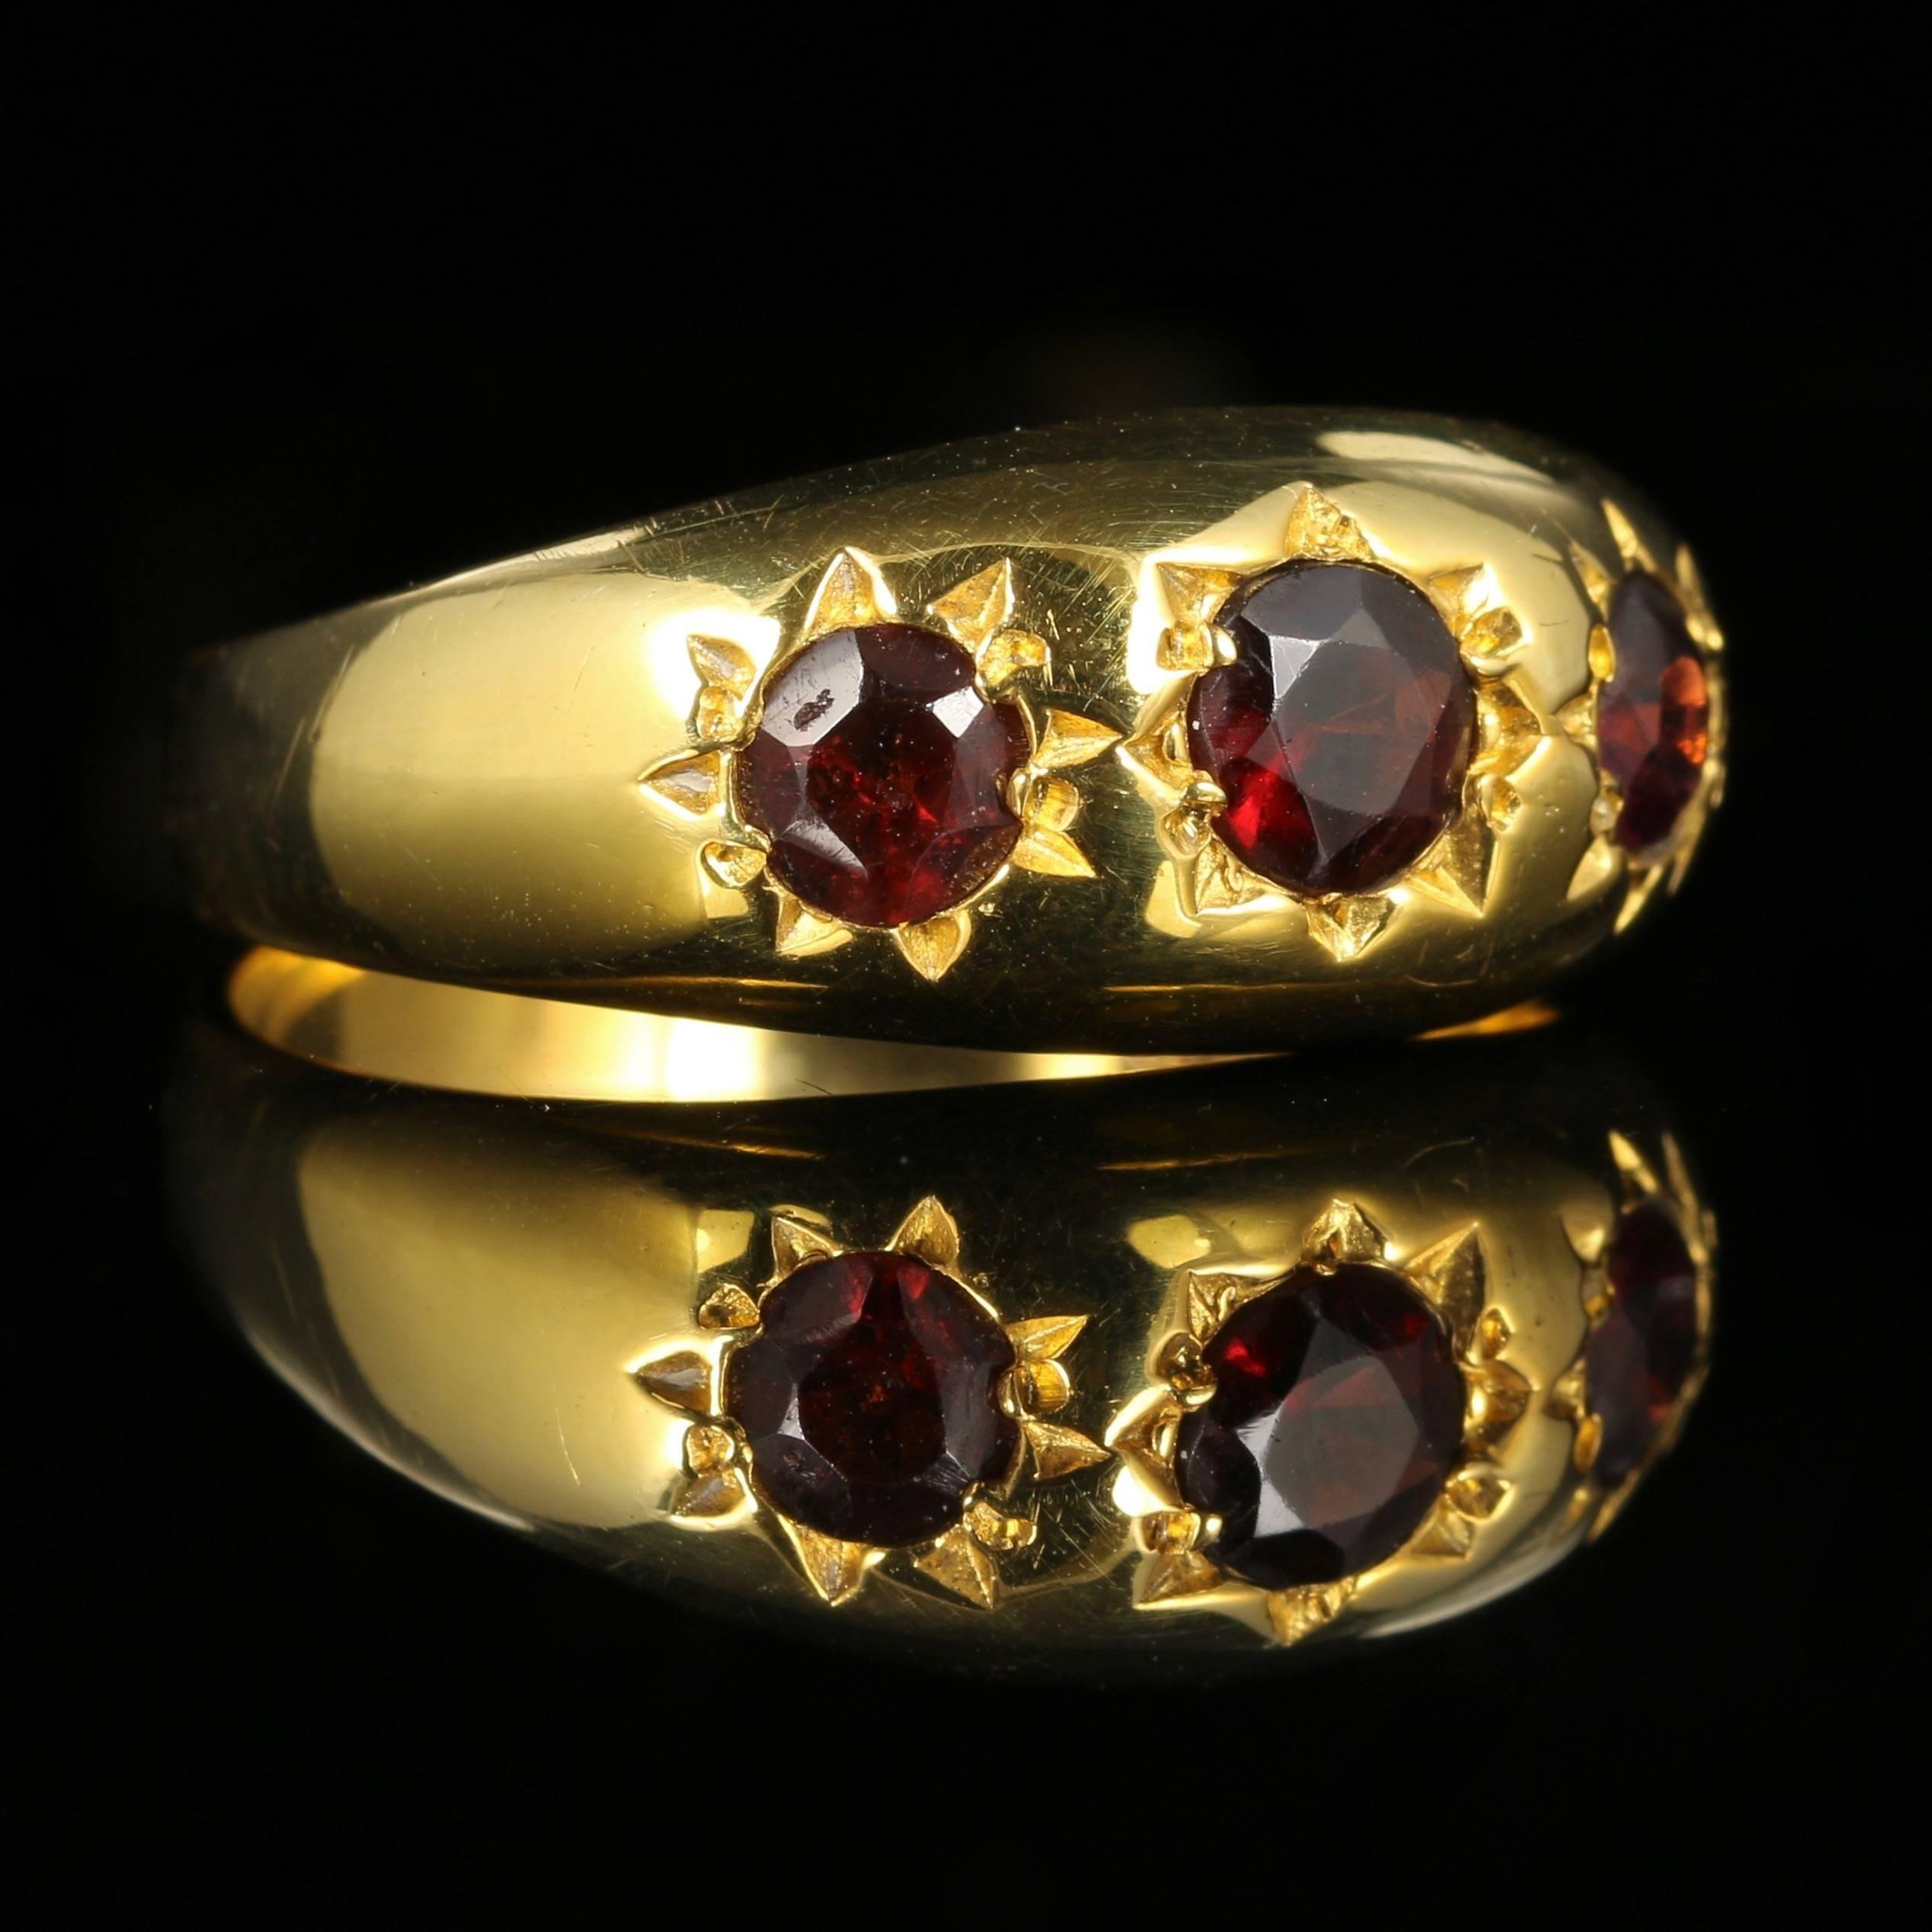 Antique Garnet Ring 18 Carat Gold on Silver circa 1900 at